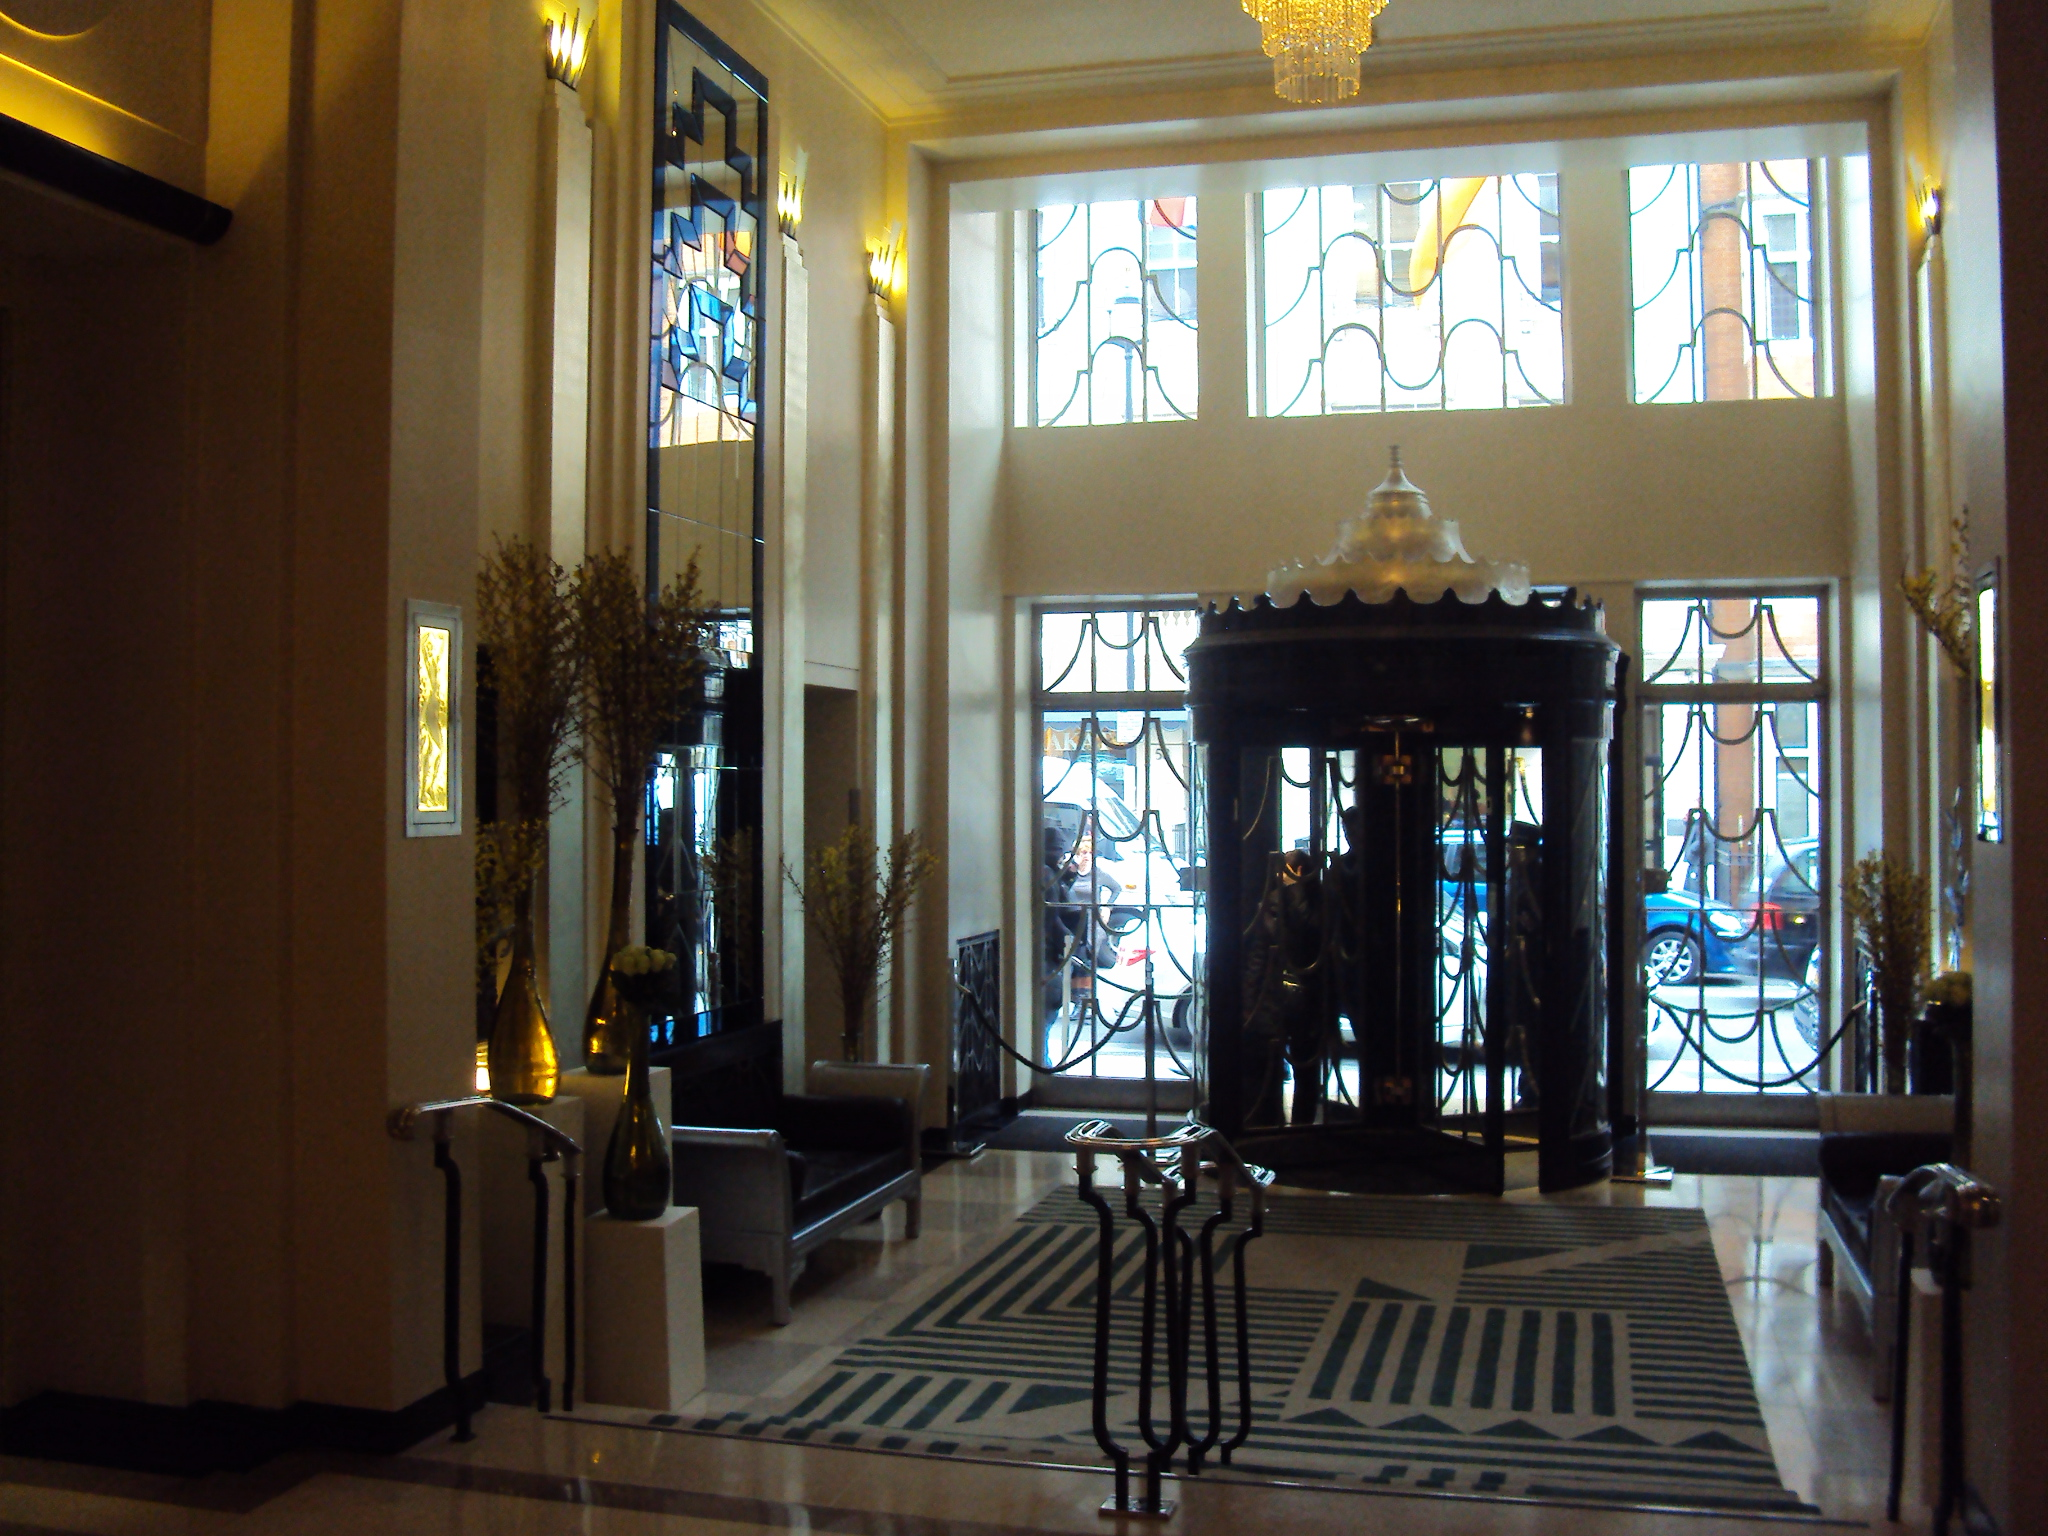 Luxury Accomodations in London The Claridges Five Star  : DSC03973 from thetravelistas.com size 2048 x 1536 jpeg 1429kB